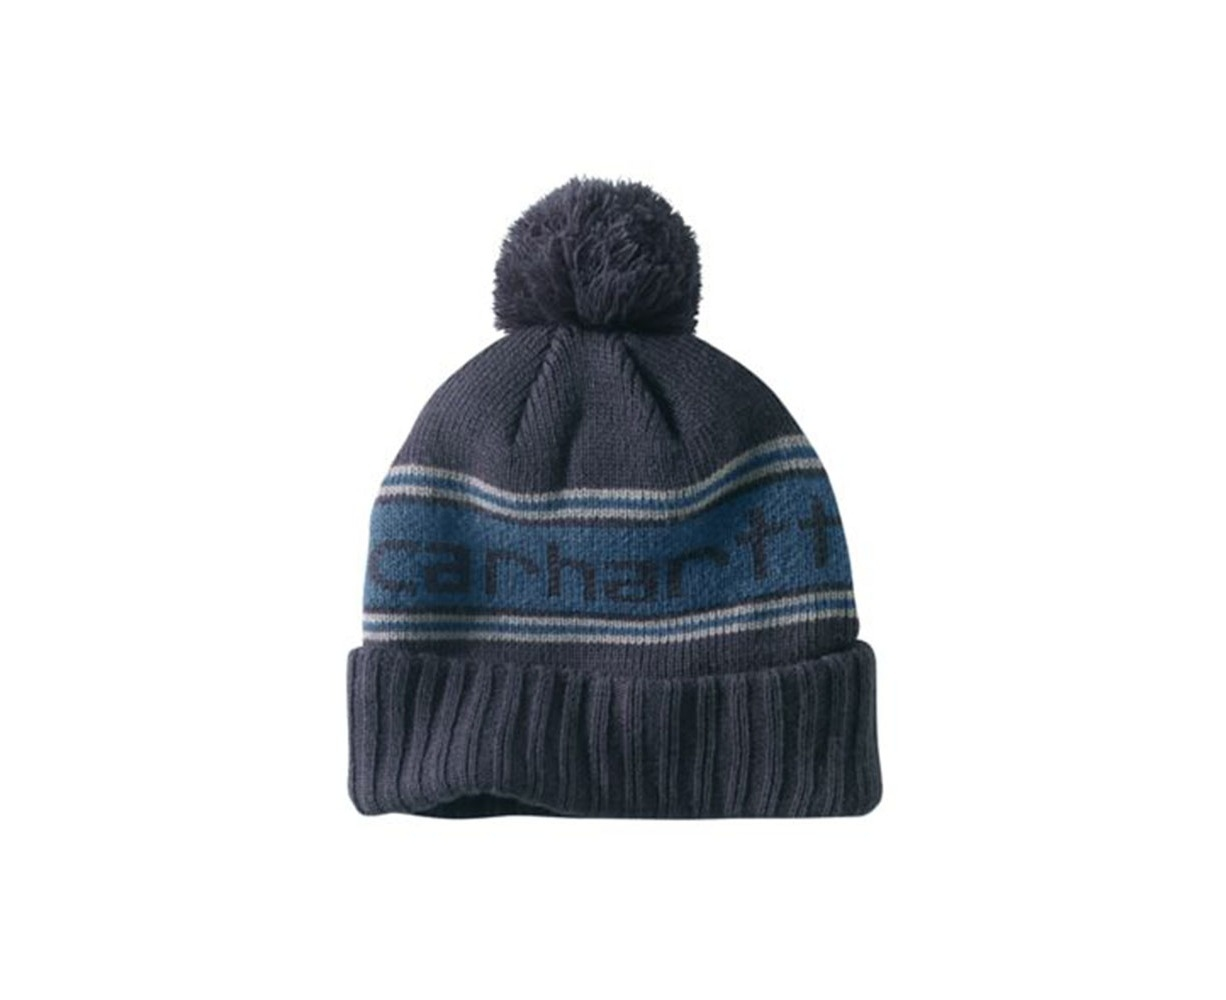 Carhartt Rexburg Hat - Navy Rib Knit Hat with Carhartt knitted logo front  7a68f1557cdd